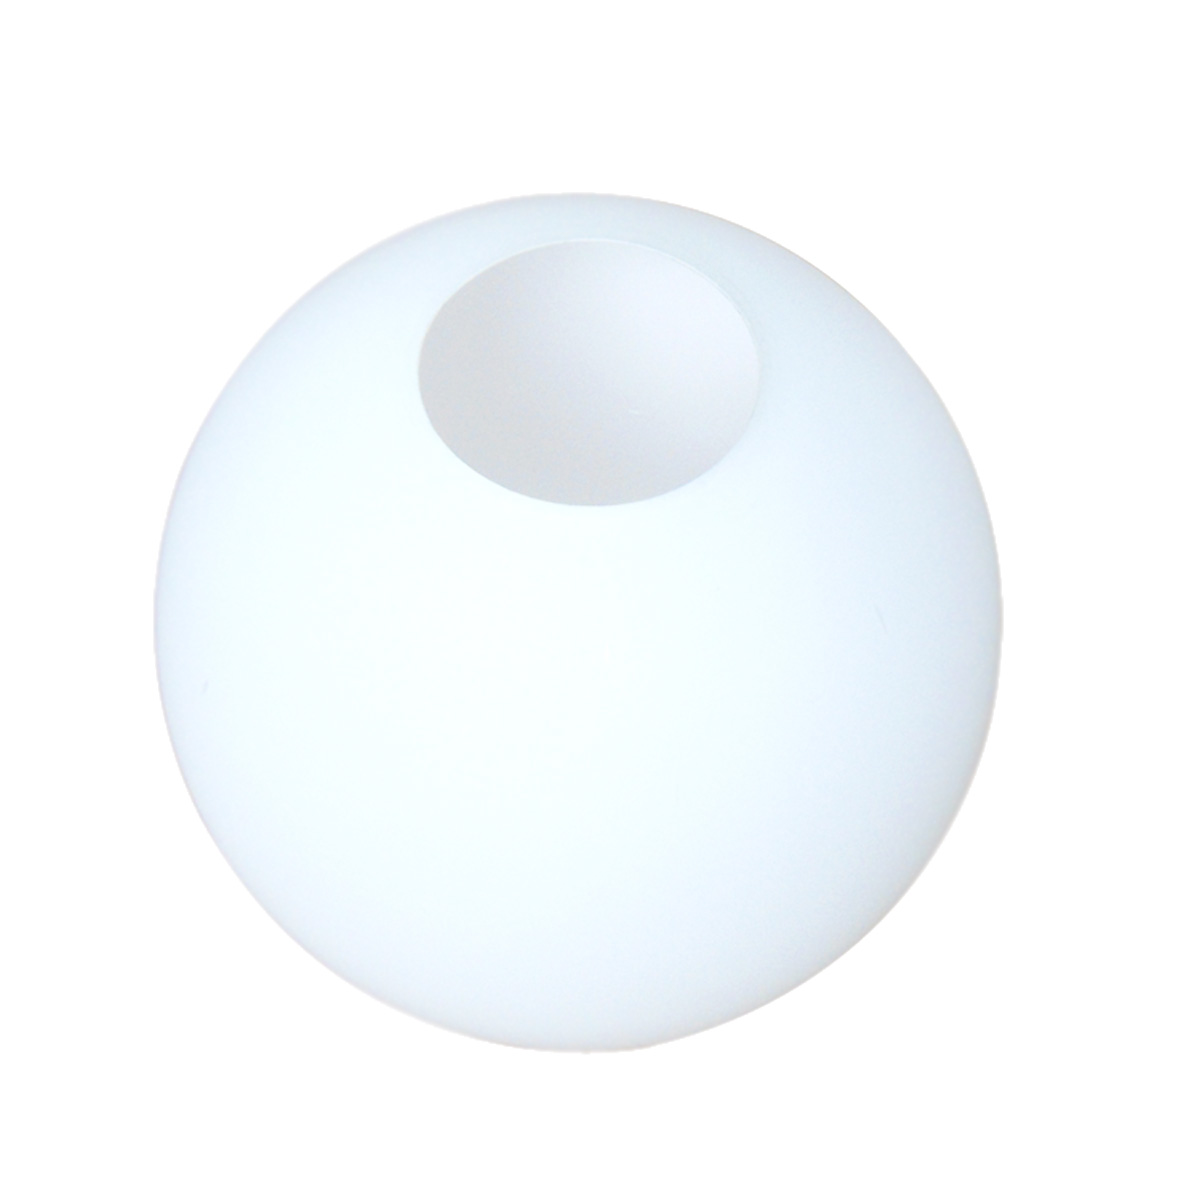 Jiawen Bar Coffee Restaurant Chandelier Glass Lamp Shade DIY Lighting Accessories Diameter 150mm